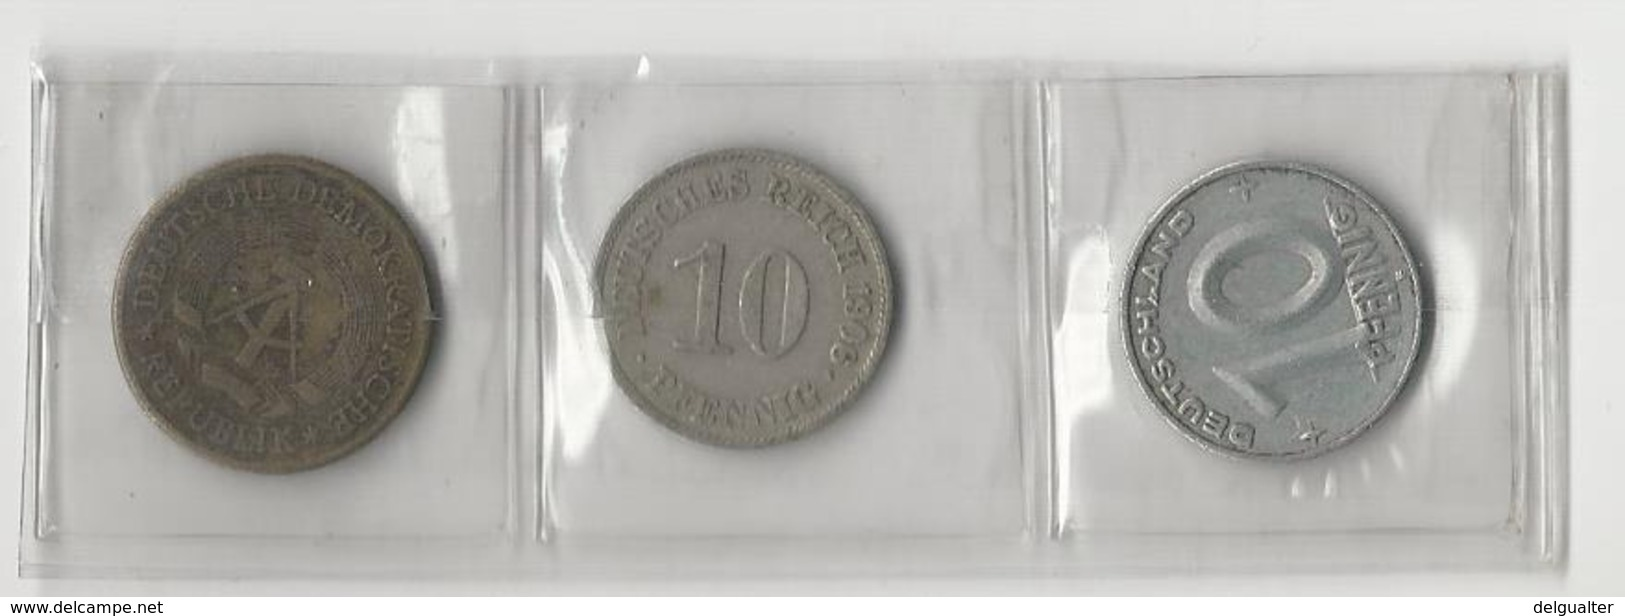 3 Coins - Coins & Banknotes